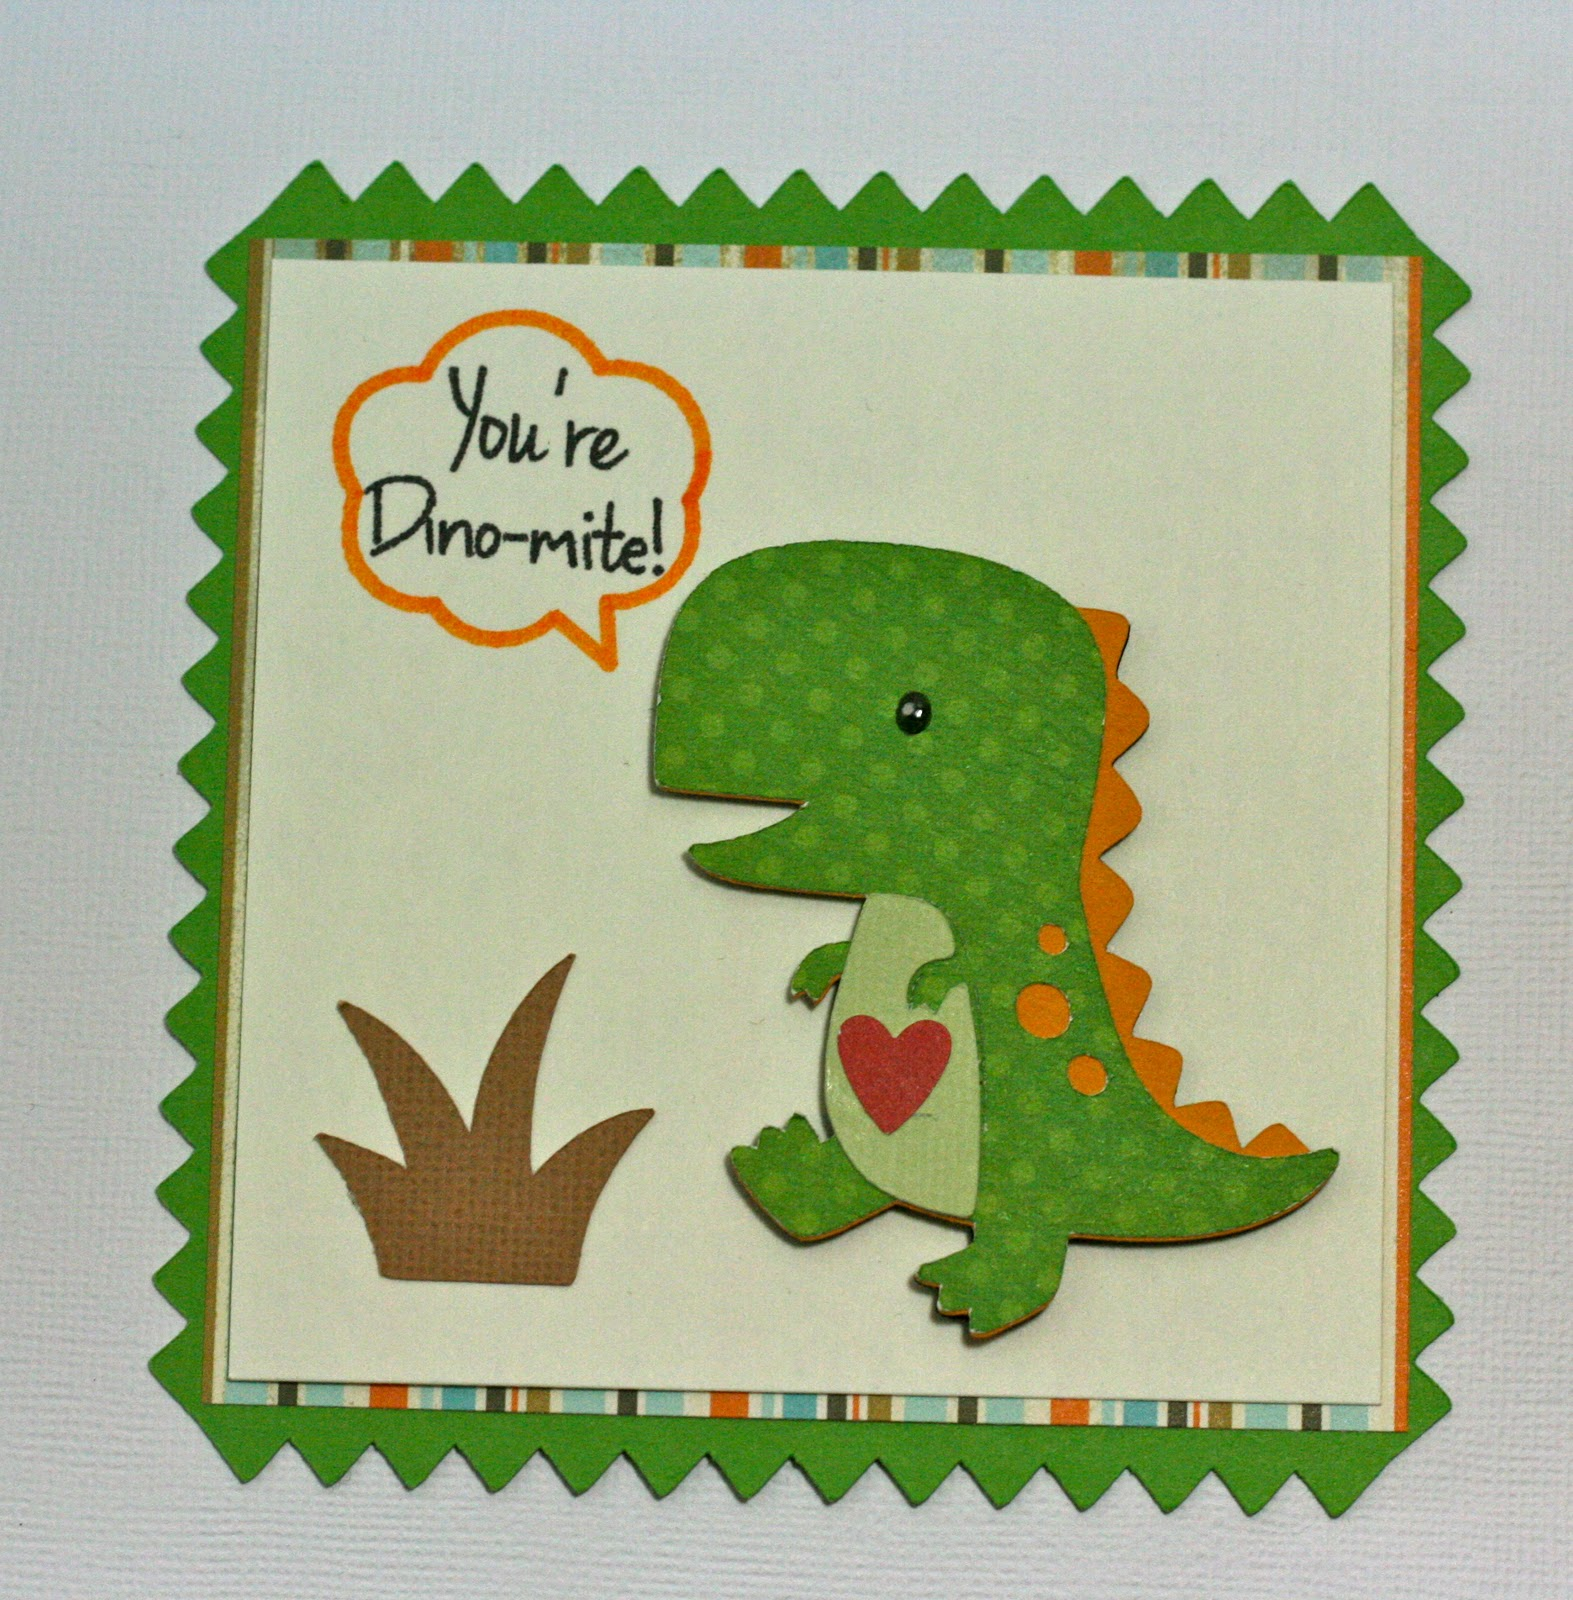 Rock Paper Cricut: You're Dino-mite